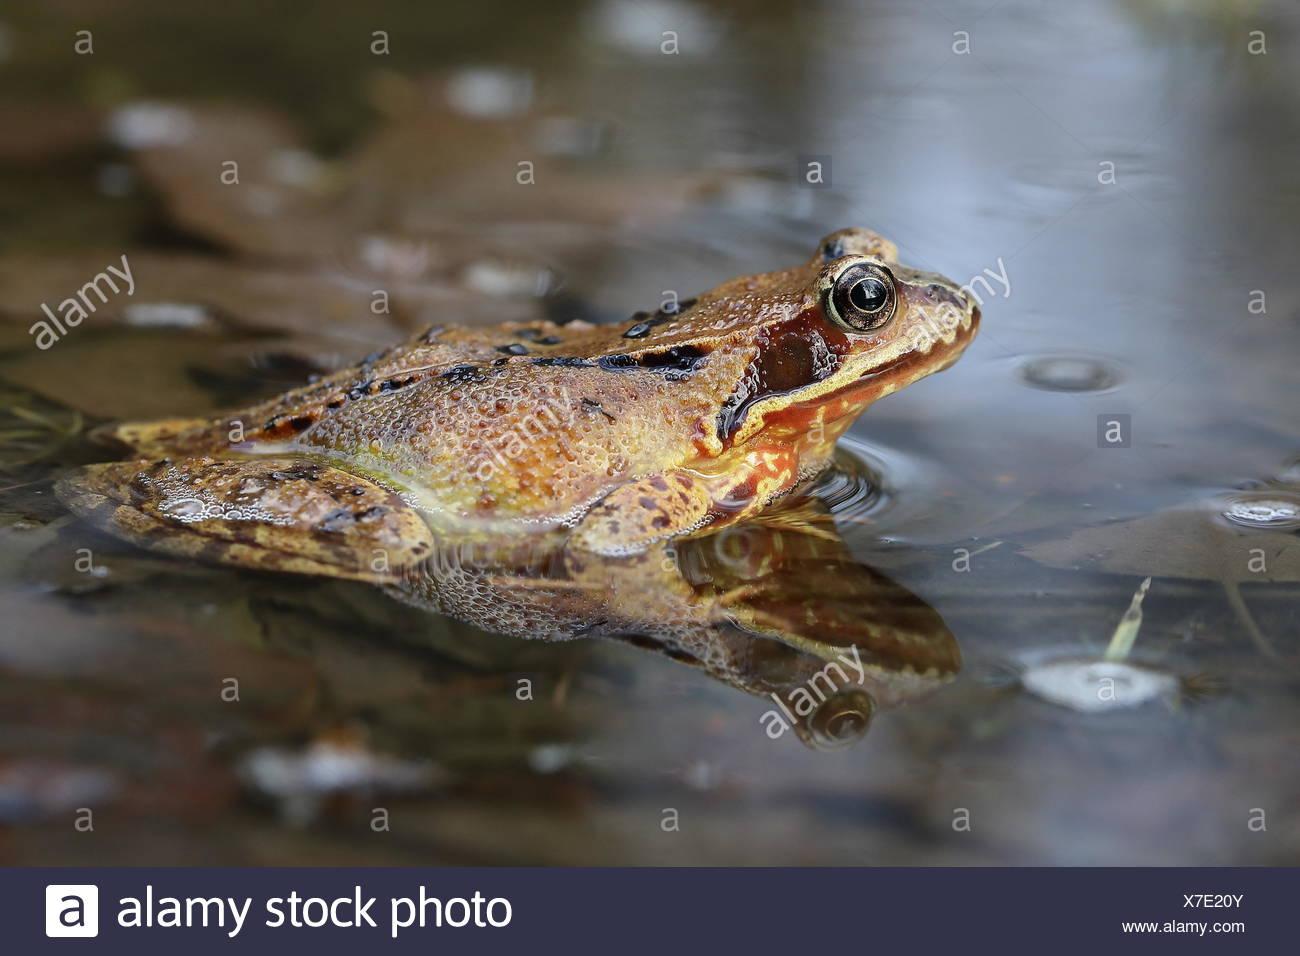 European common frog (Rana temporaria) sitting in shallow water, Malscheid Nature Reserve, Siegerland, North Rhine-Westphalia - Stock Image